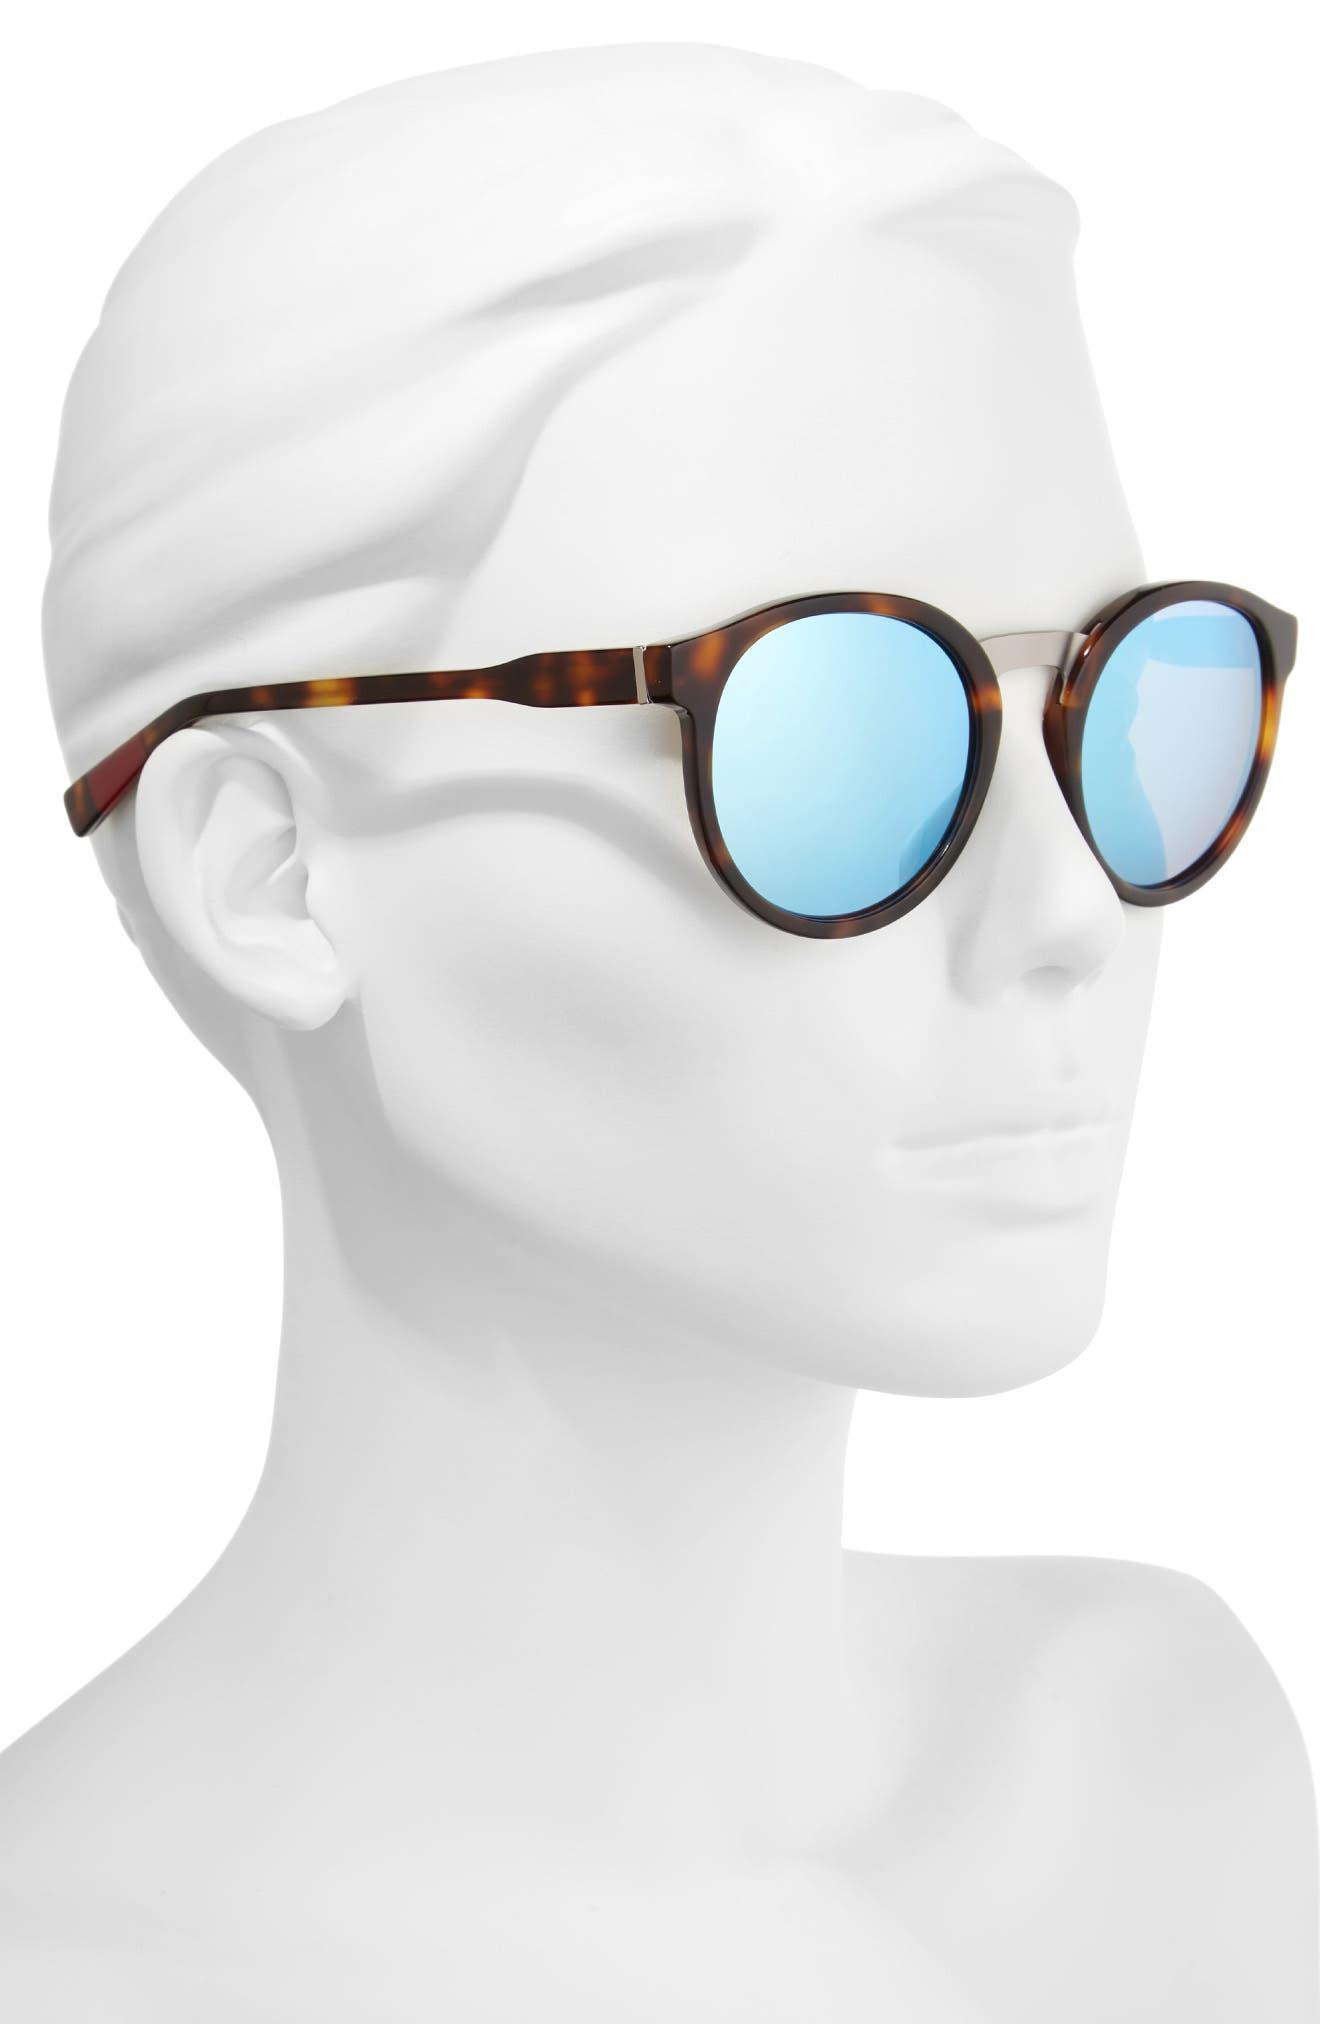 53mm Round Sunglasses,                             Alternate thumbnail 6, color,